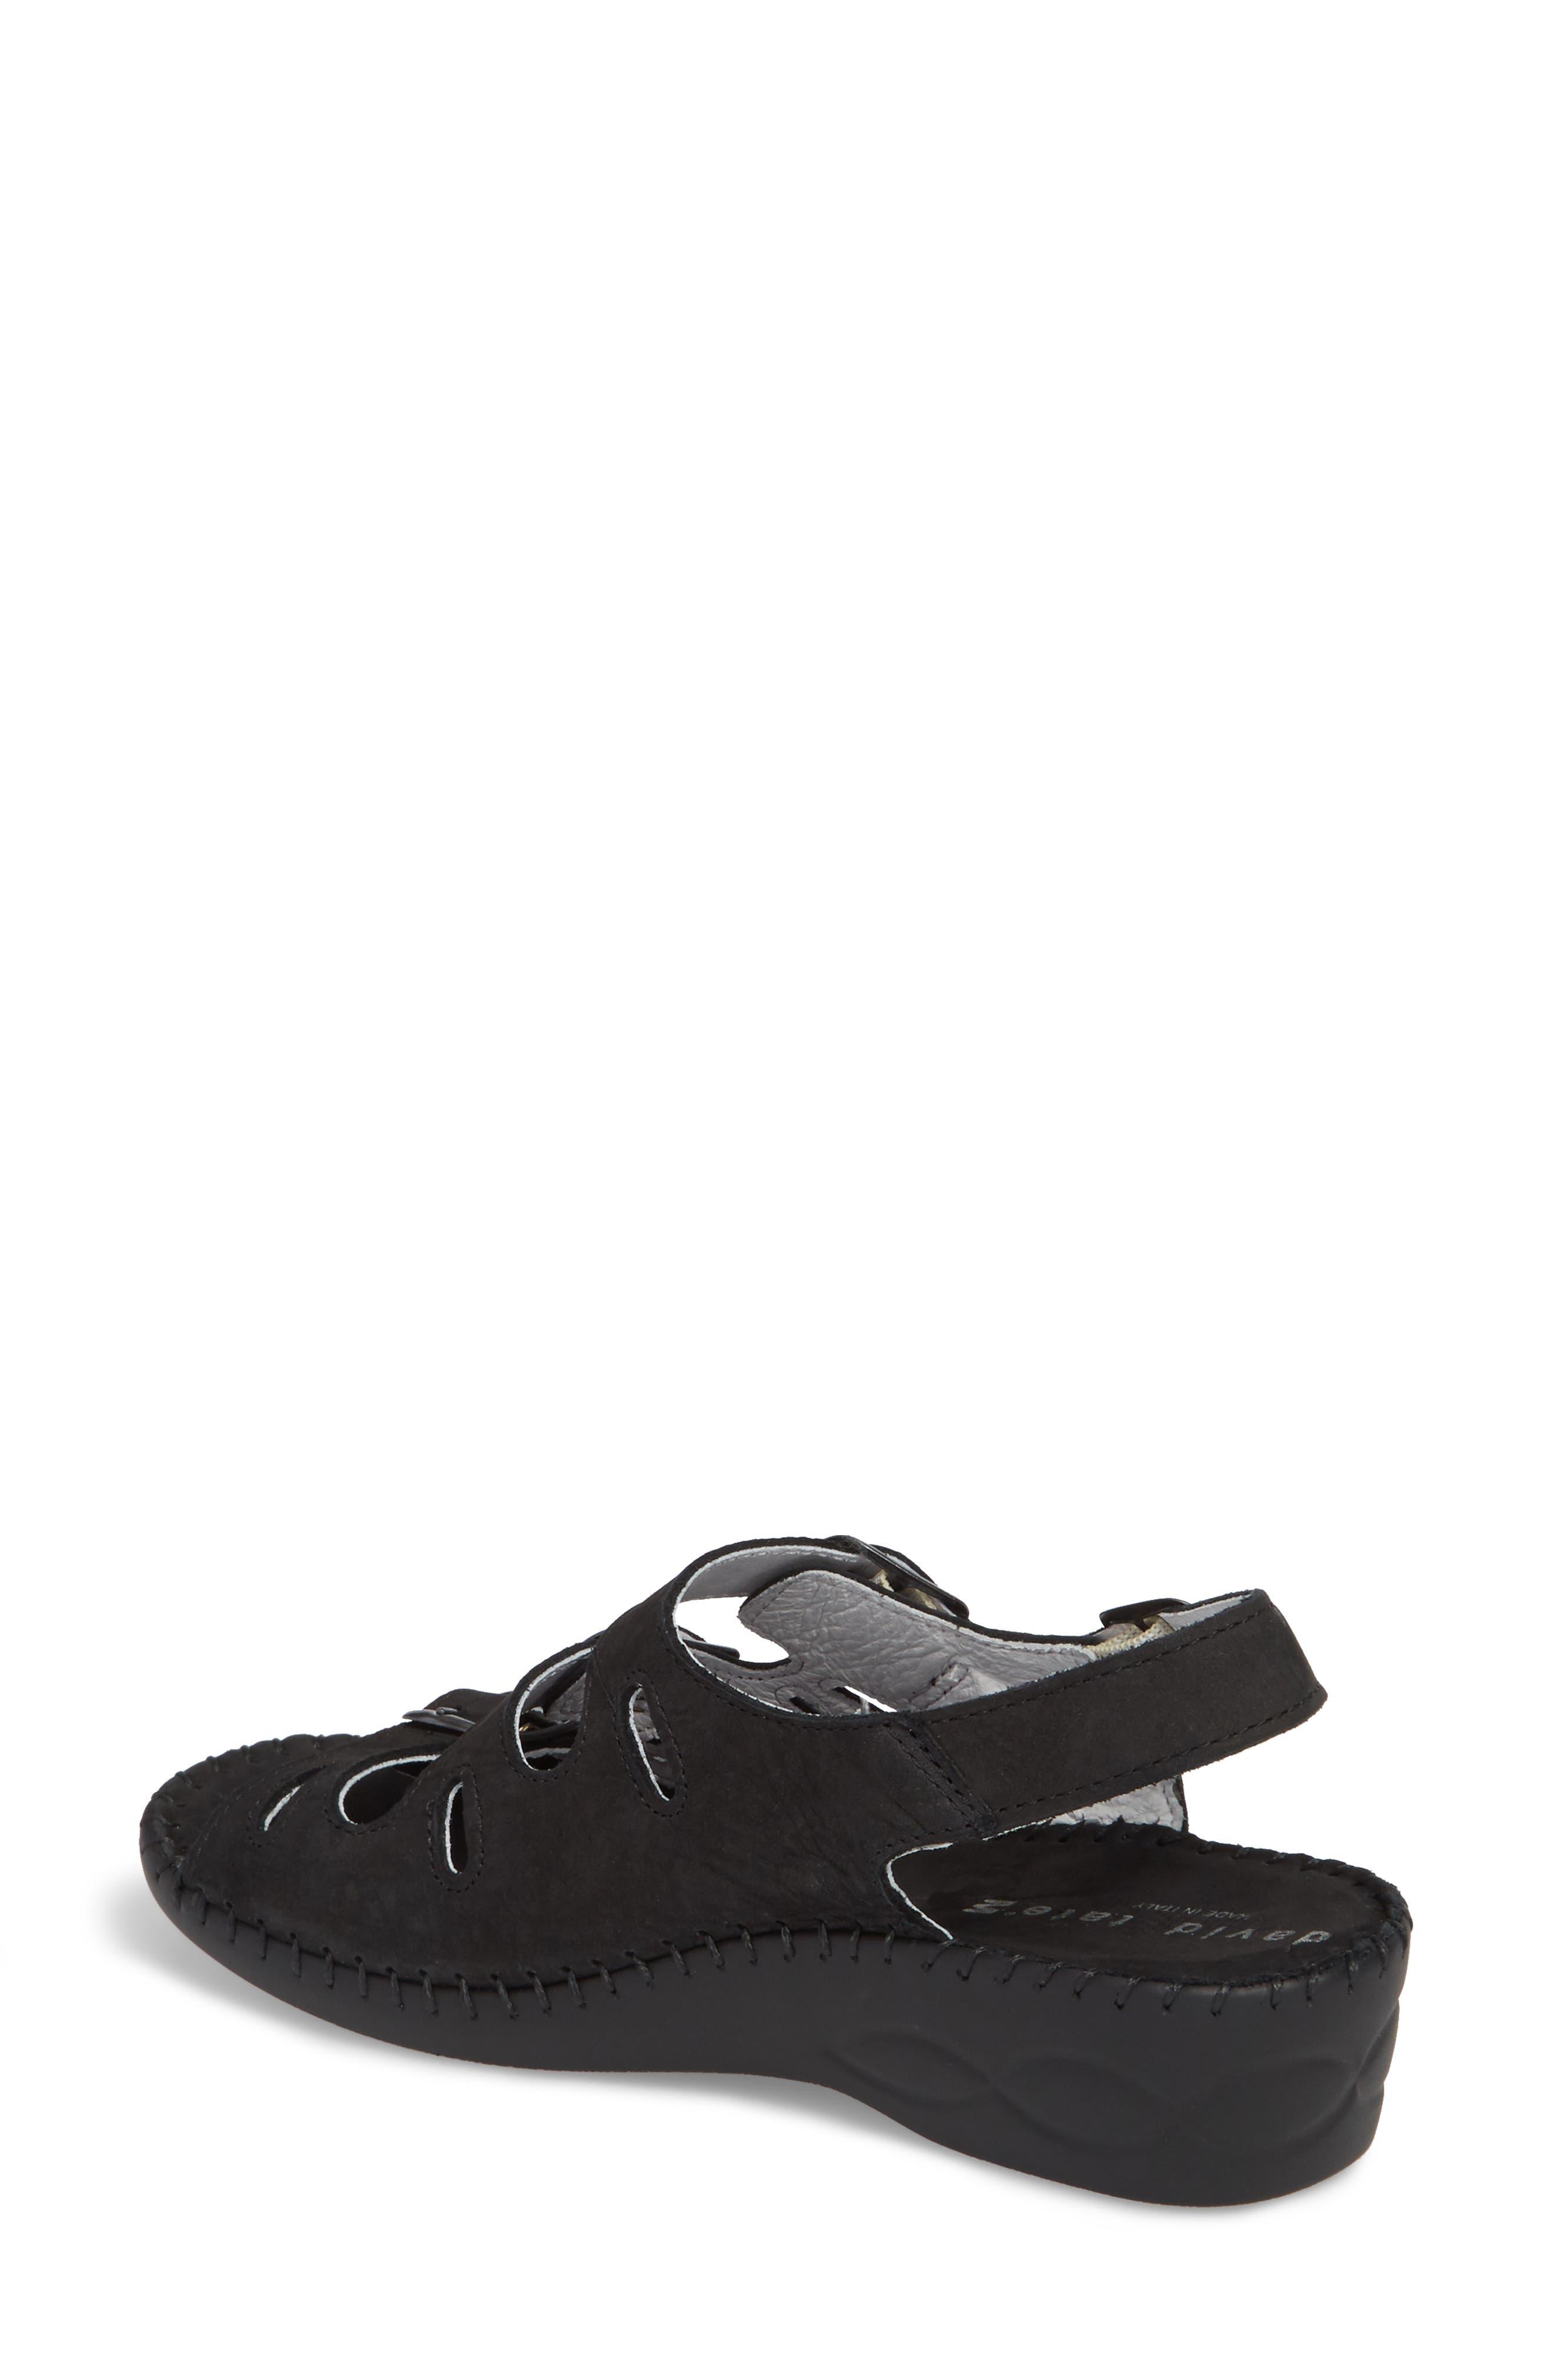 Luna Slingback Wedge Sandal,                             Alternate thumbnail 2, color,                             BLACK NUBUCK